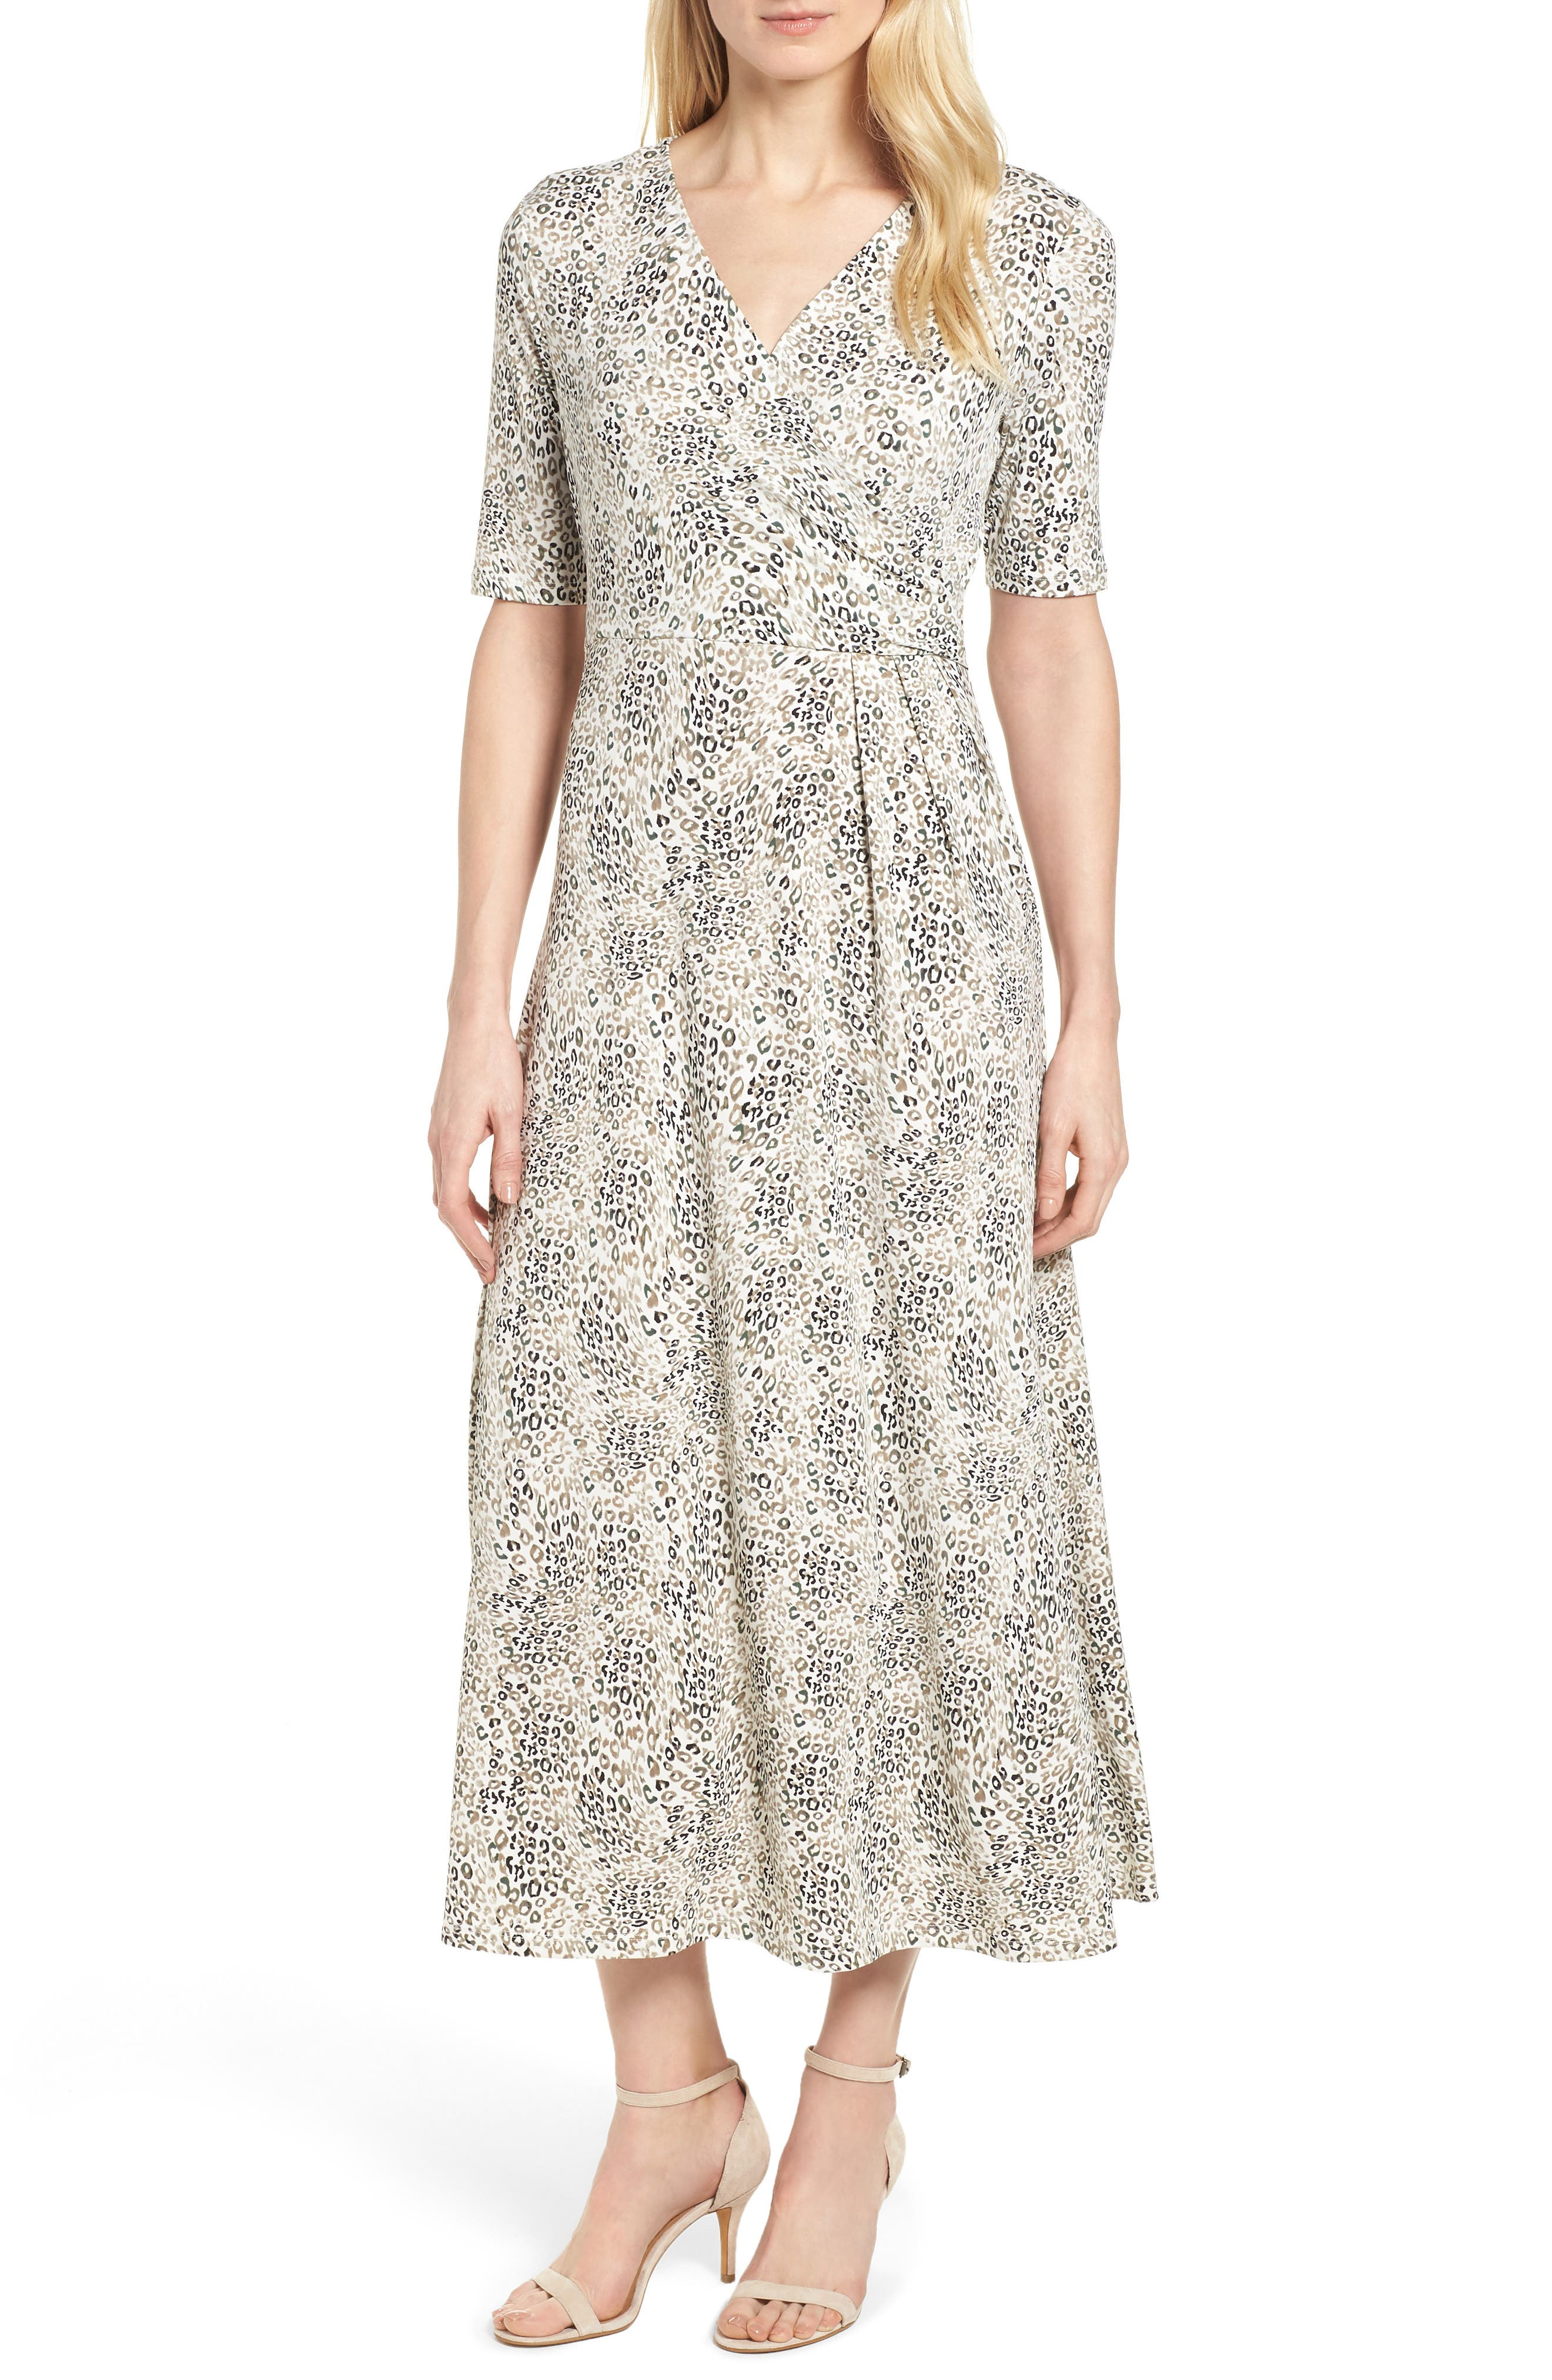 Leopard Print Maxi Dress,                             Main thumbnail 1, color,                             103-New Ivory